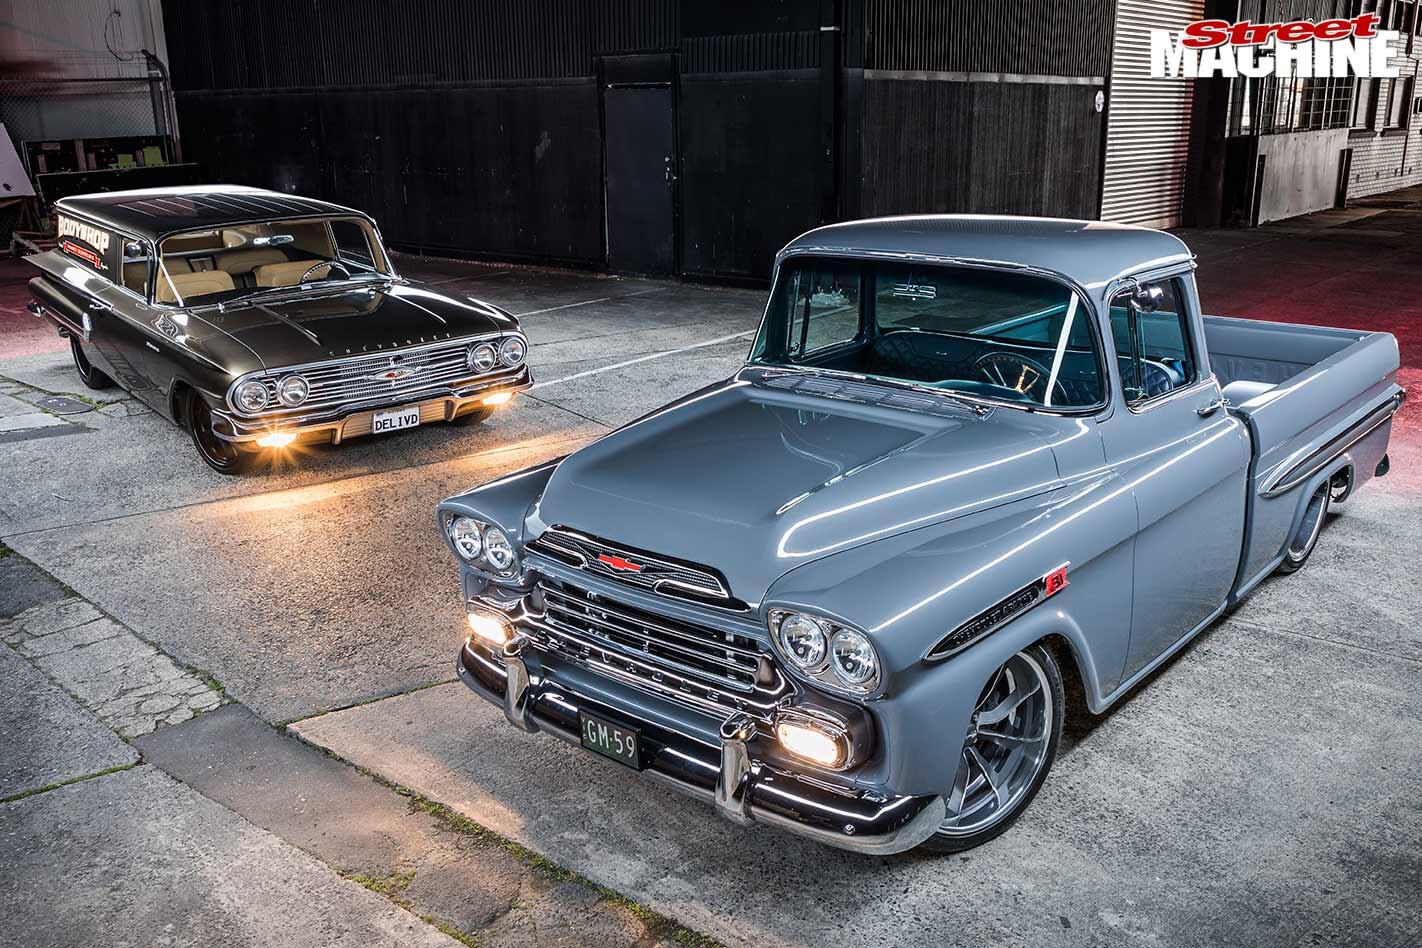 Chev Apache Fleetside and Biscayne sedan delivery